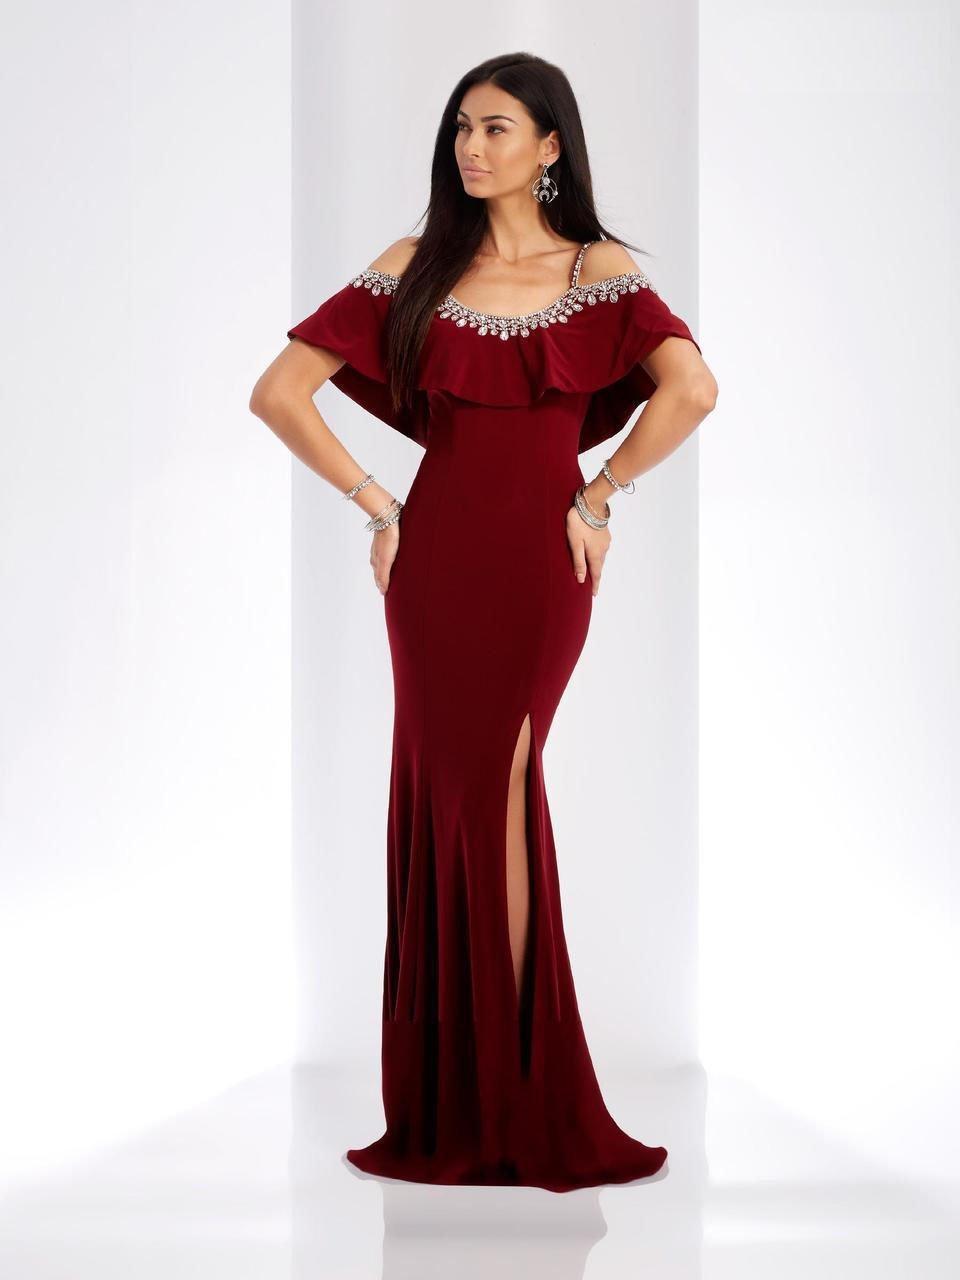 Clarisse - 3497 Jeweled Scoop Neck Sheath Dress